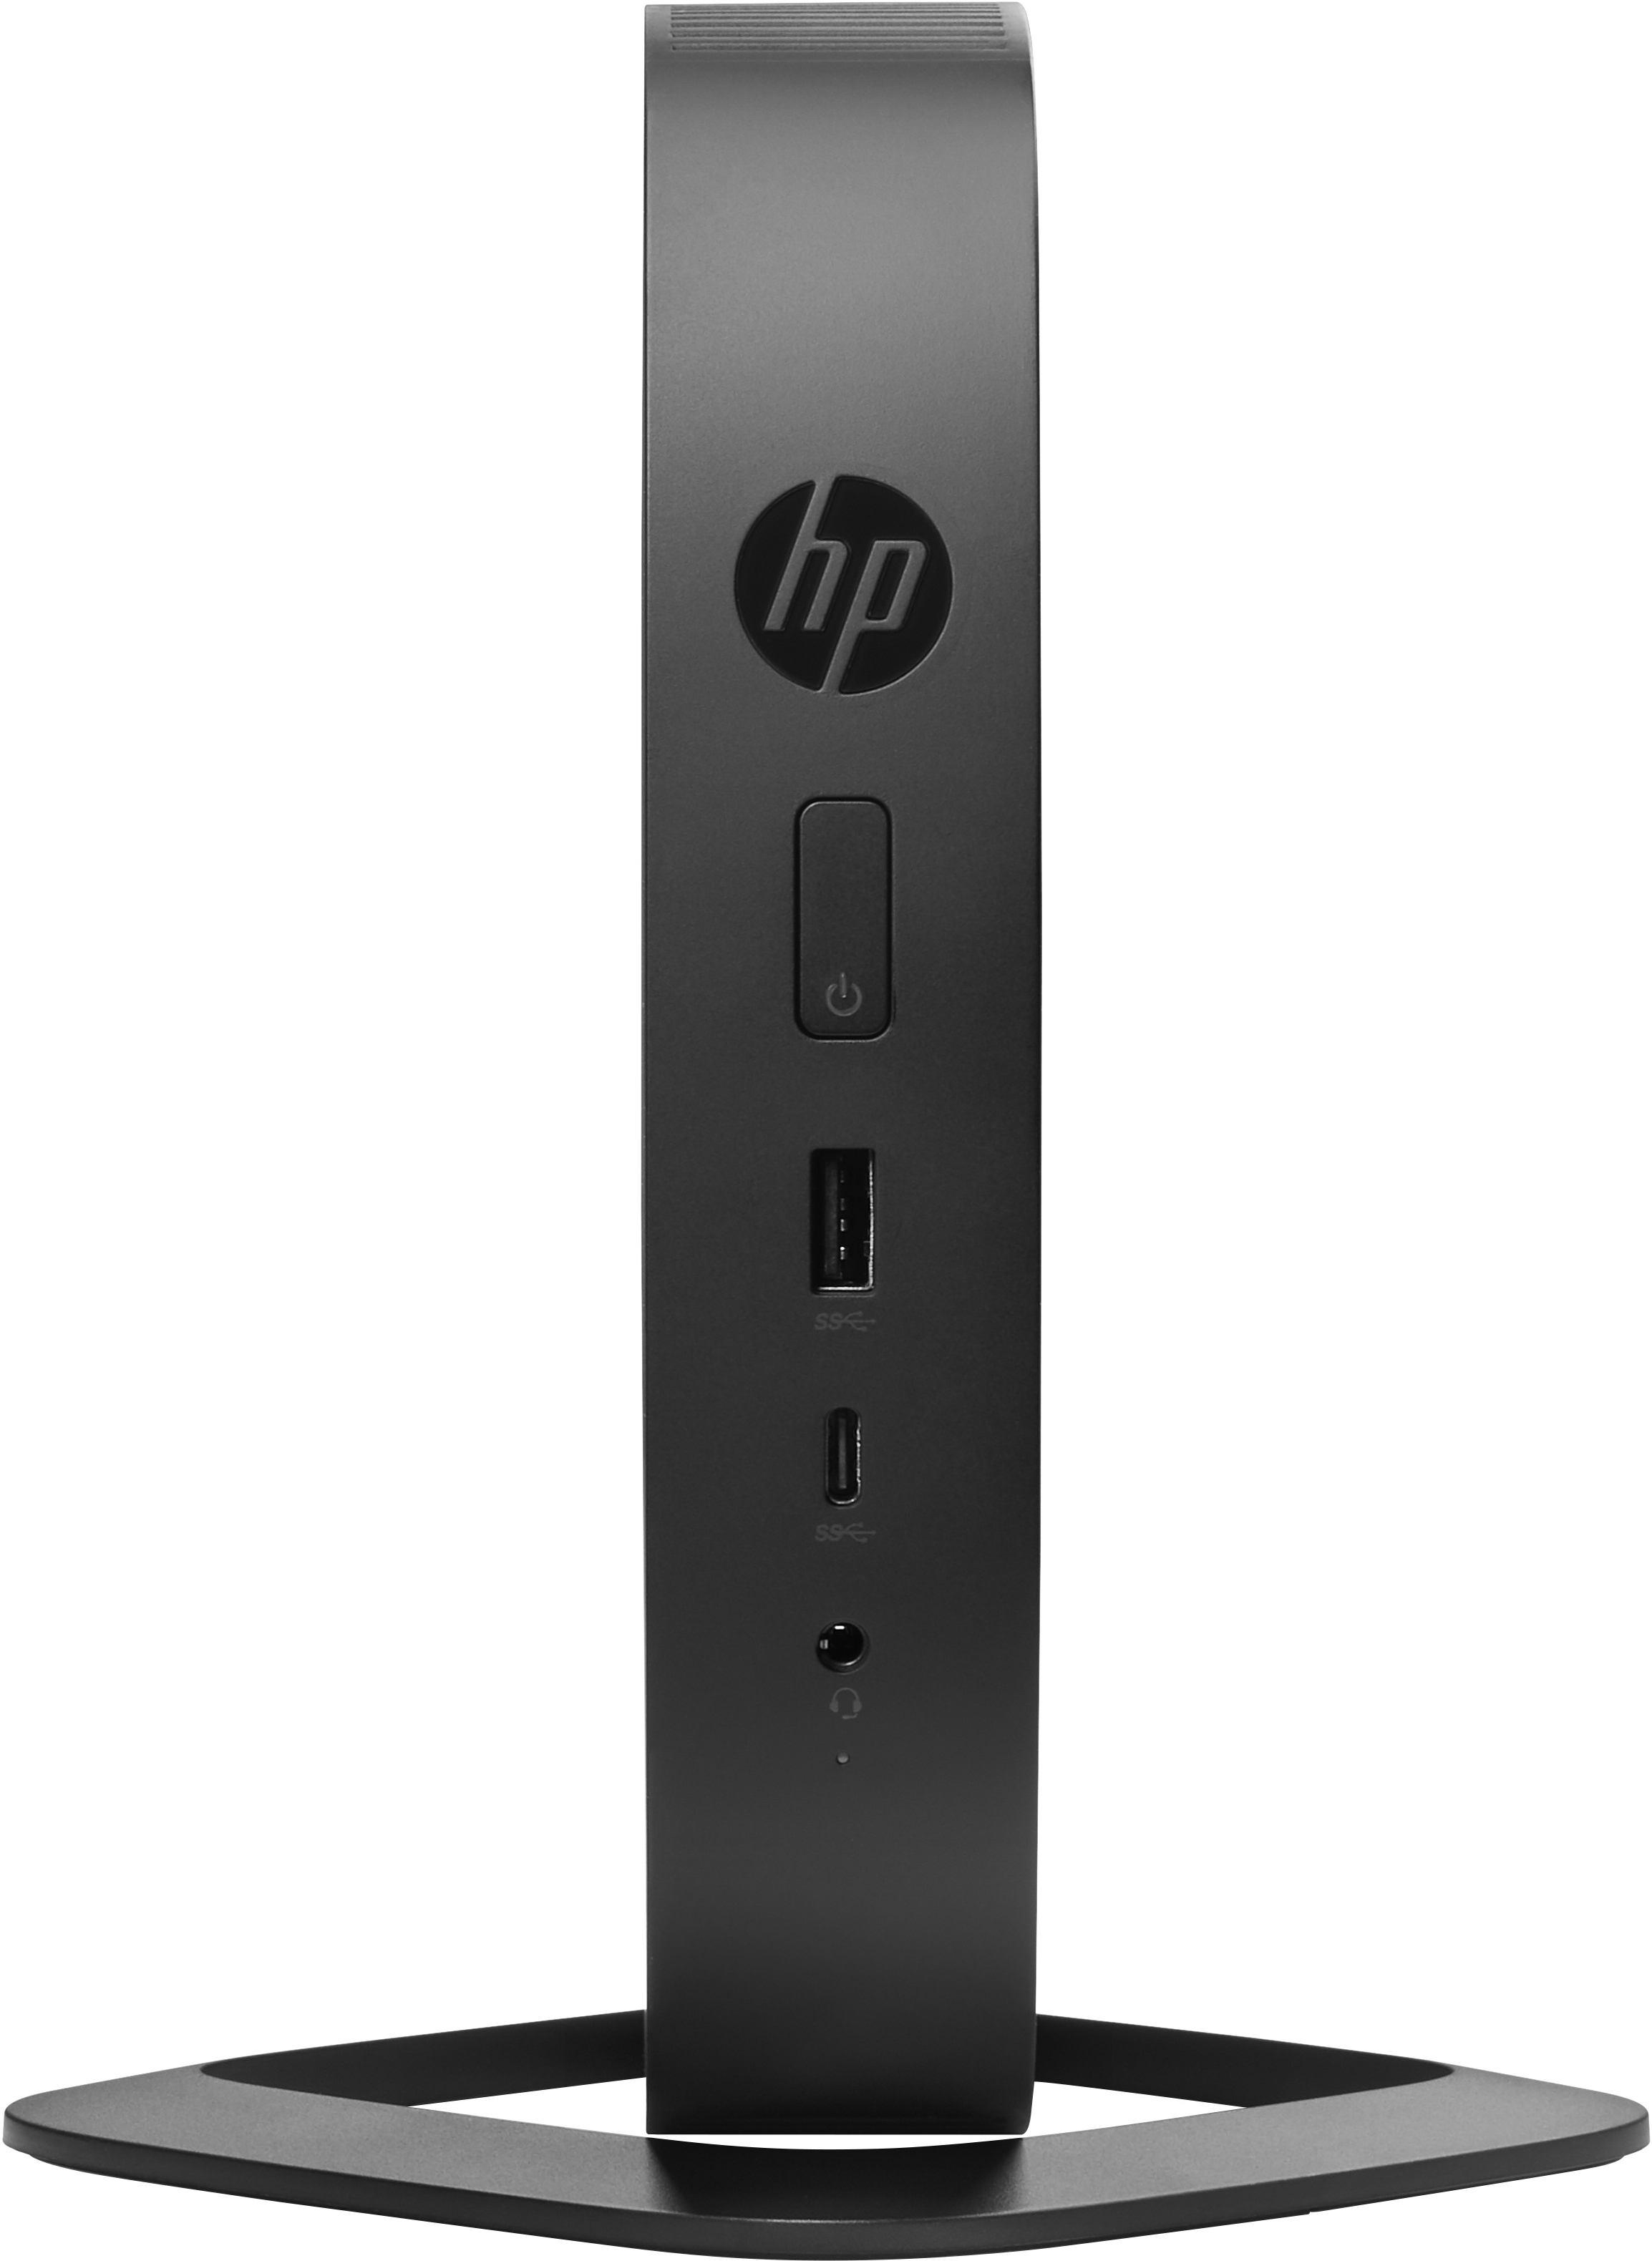 2061337-HP-t530-1-5-GHz-GX-215JJ-Nero-Windows-10-IoT-Enterprise-960-g-T530-AMD